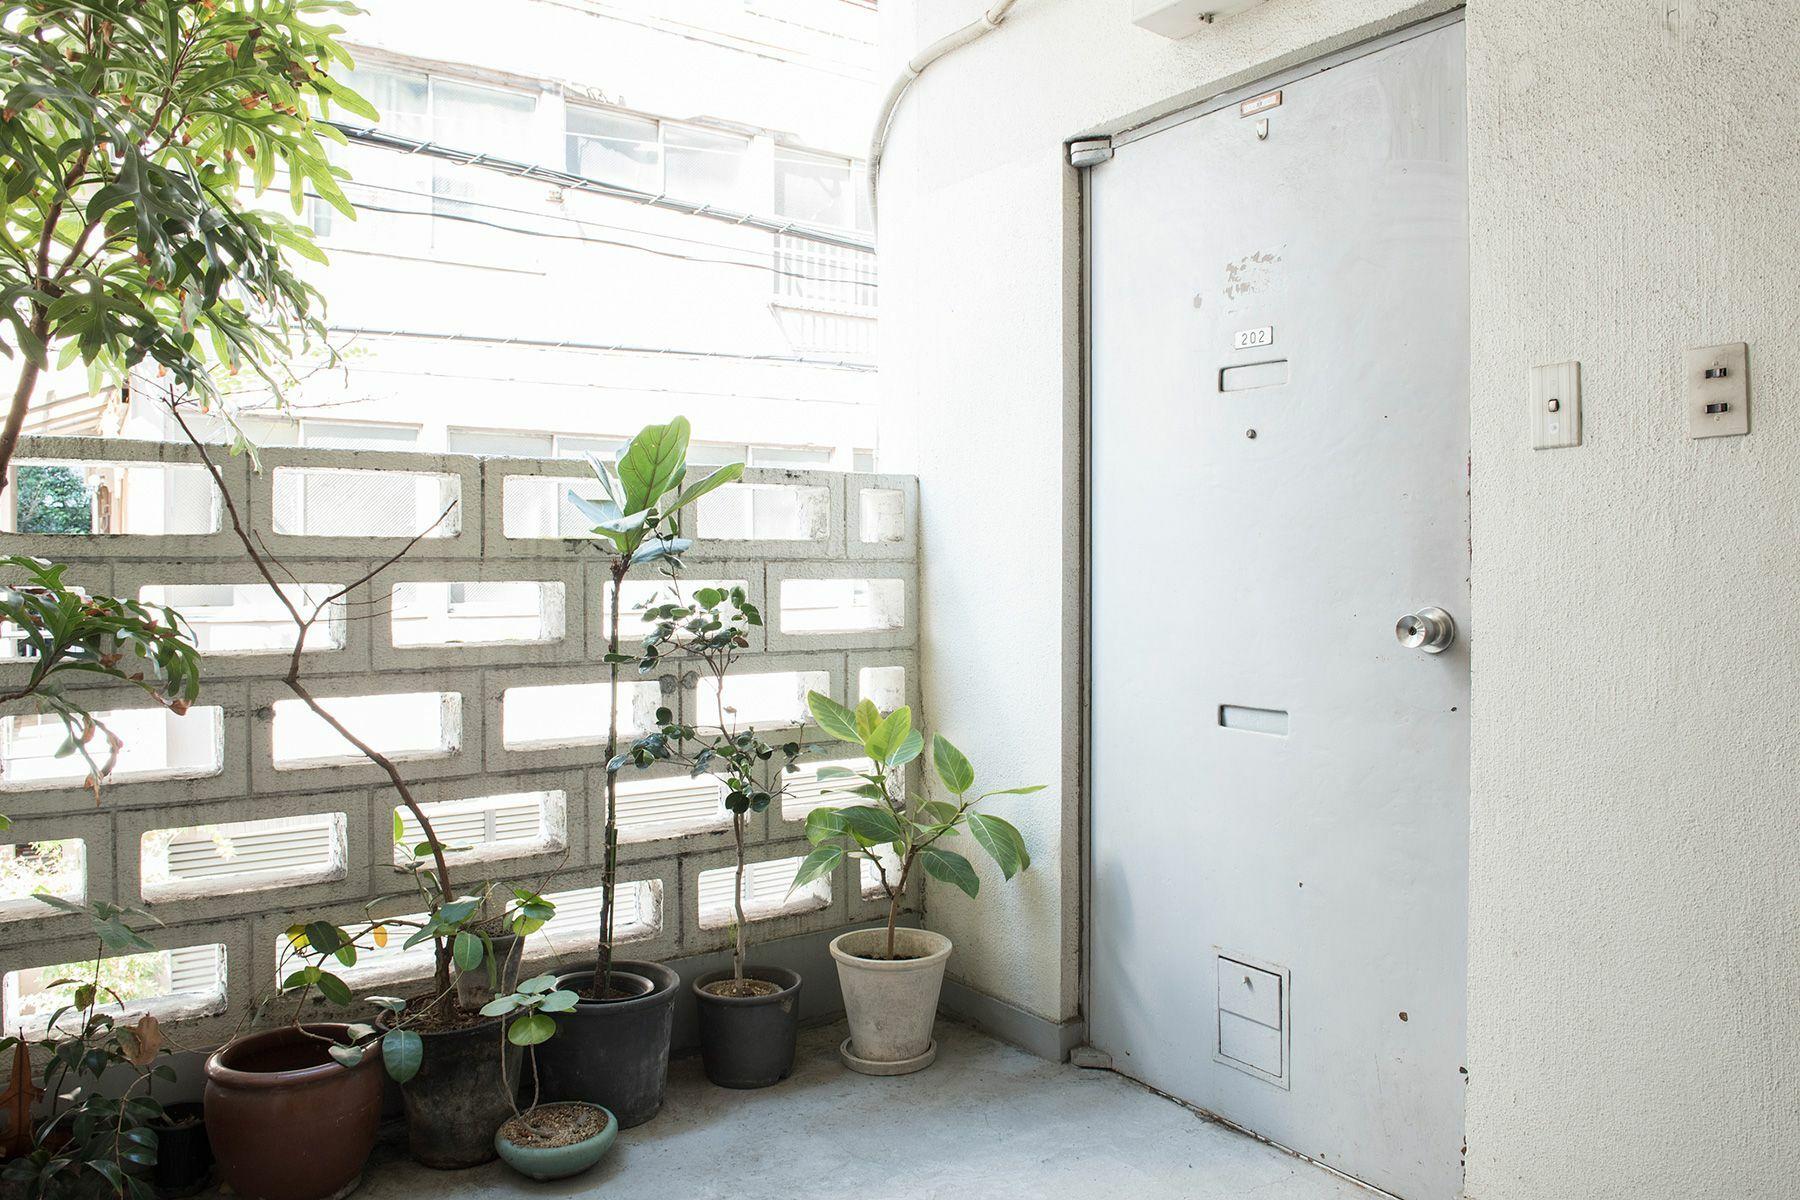 cobaco kitchen(コバコ キッチン)調理器具